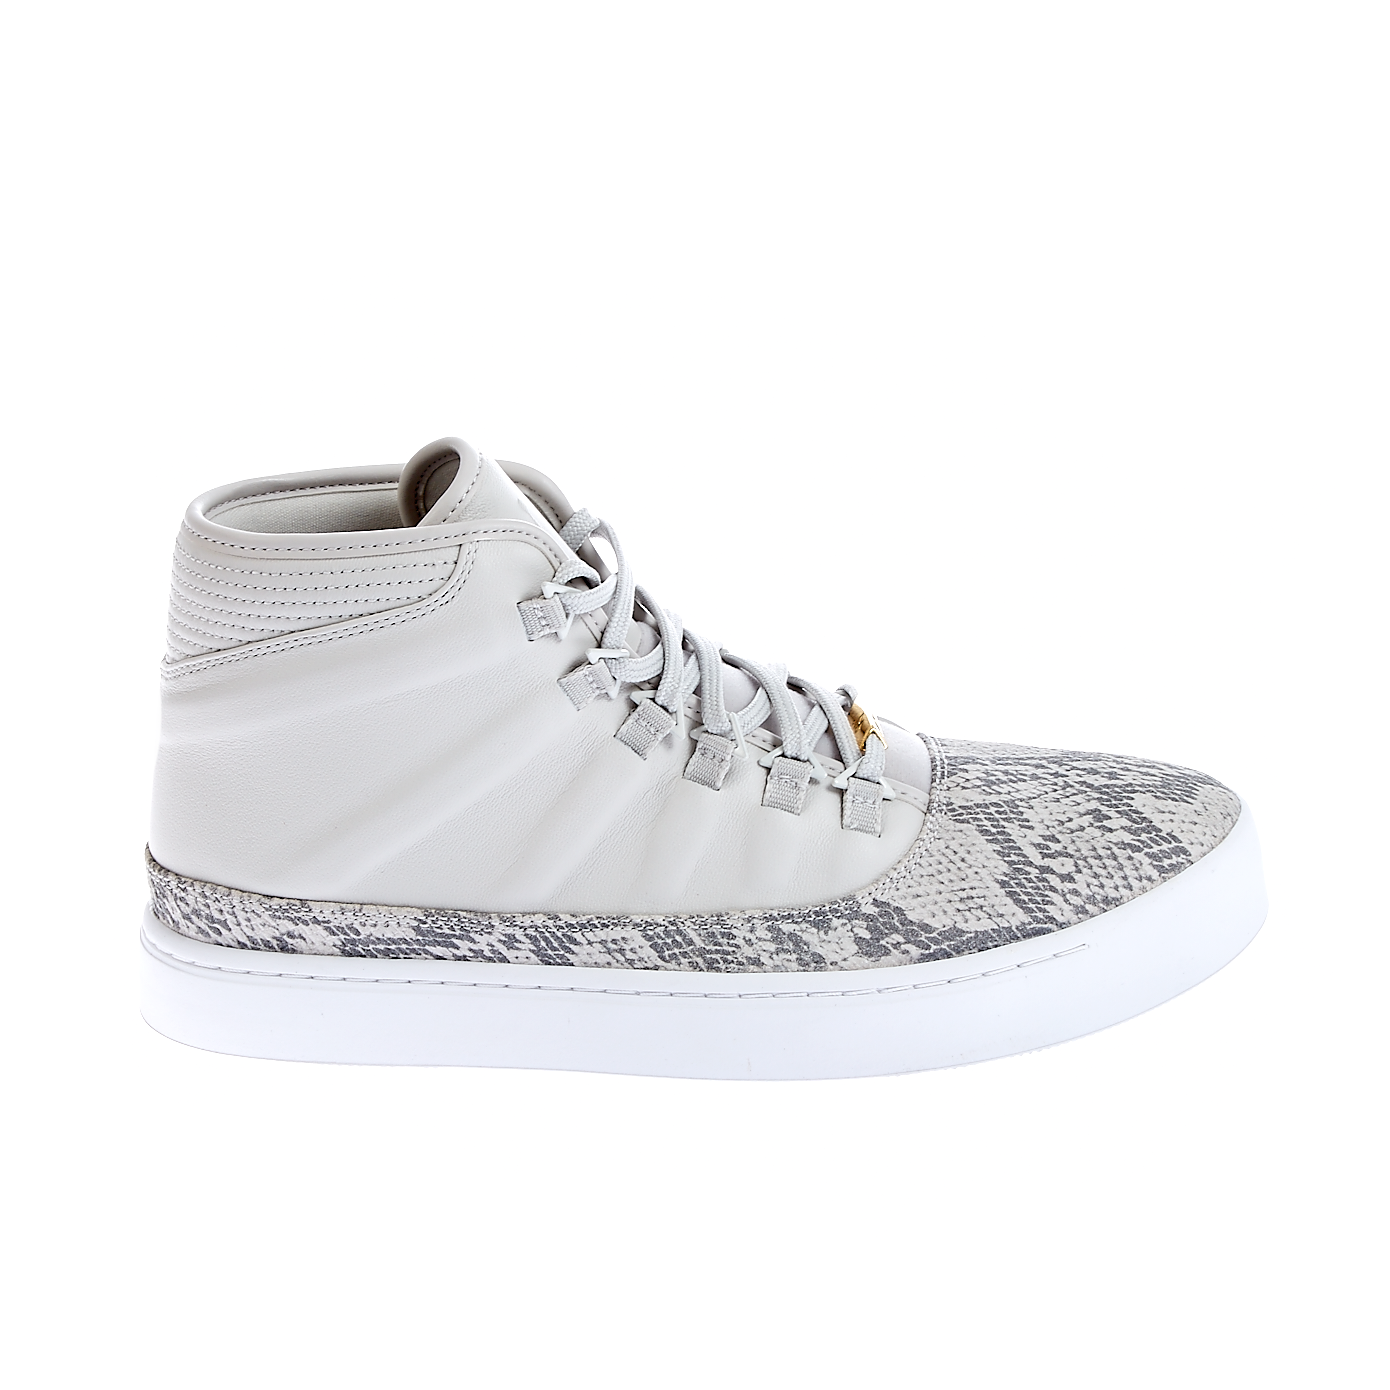 NIKE – Ανδρικά παπούτσια Nike JORDAN WESTBROOK εκρού